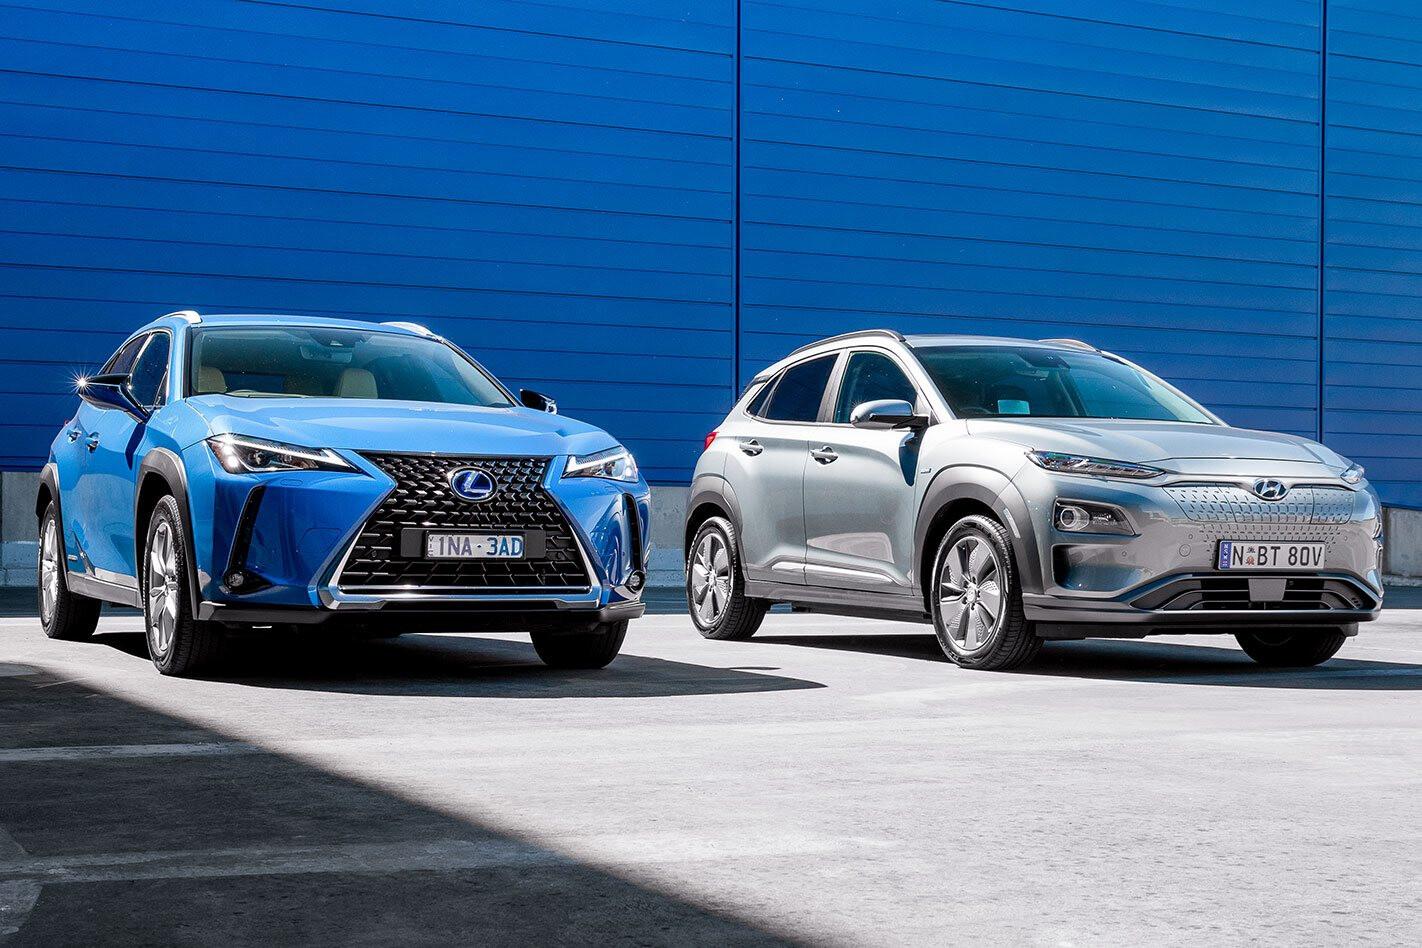 Hyundai Kona Highlander EV vs Lexus UX250H Comparison